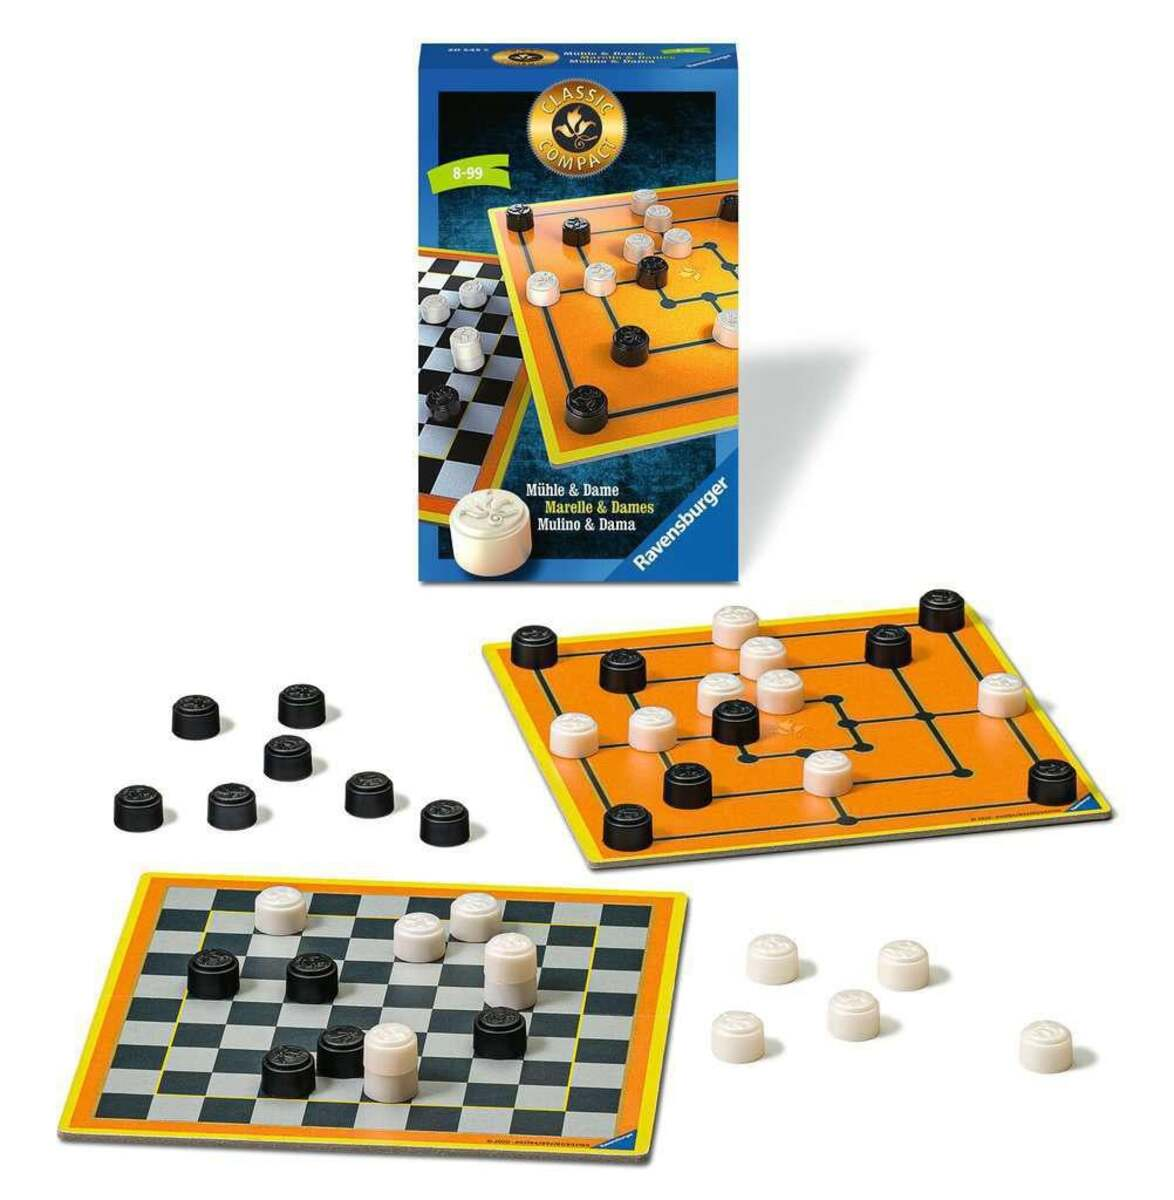 Bild 2 von Ravensburger Classic Compact: Mühle & Dame Taktikspiele